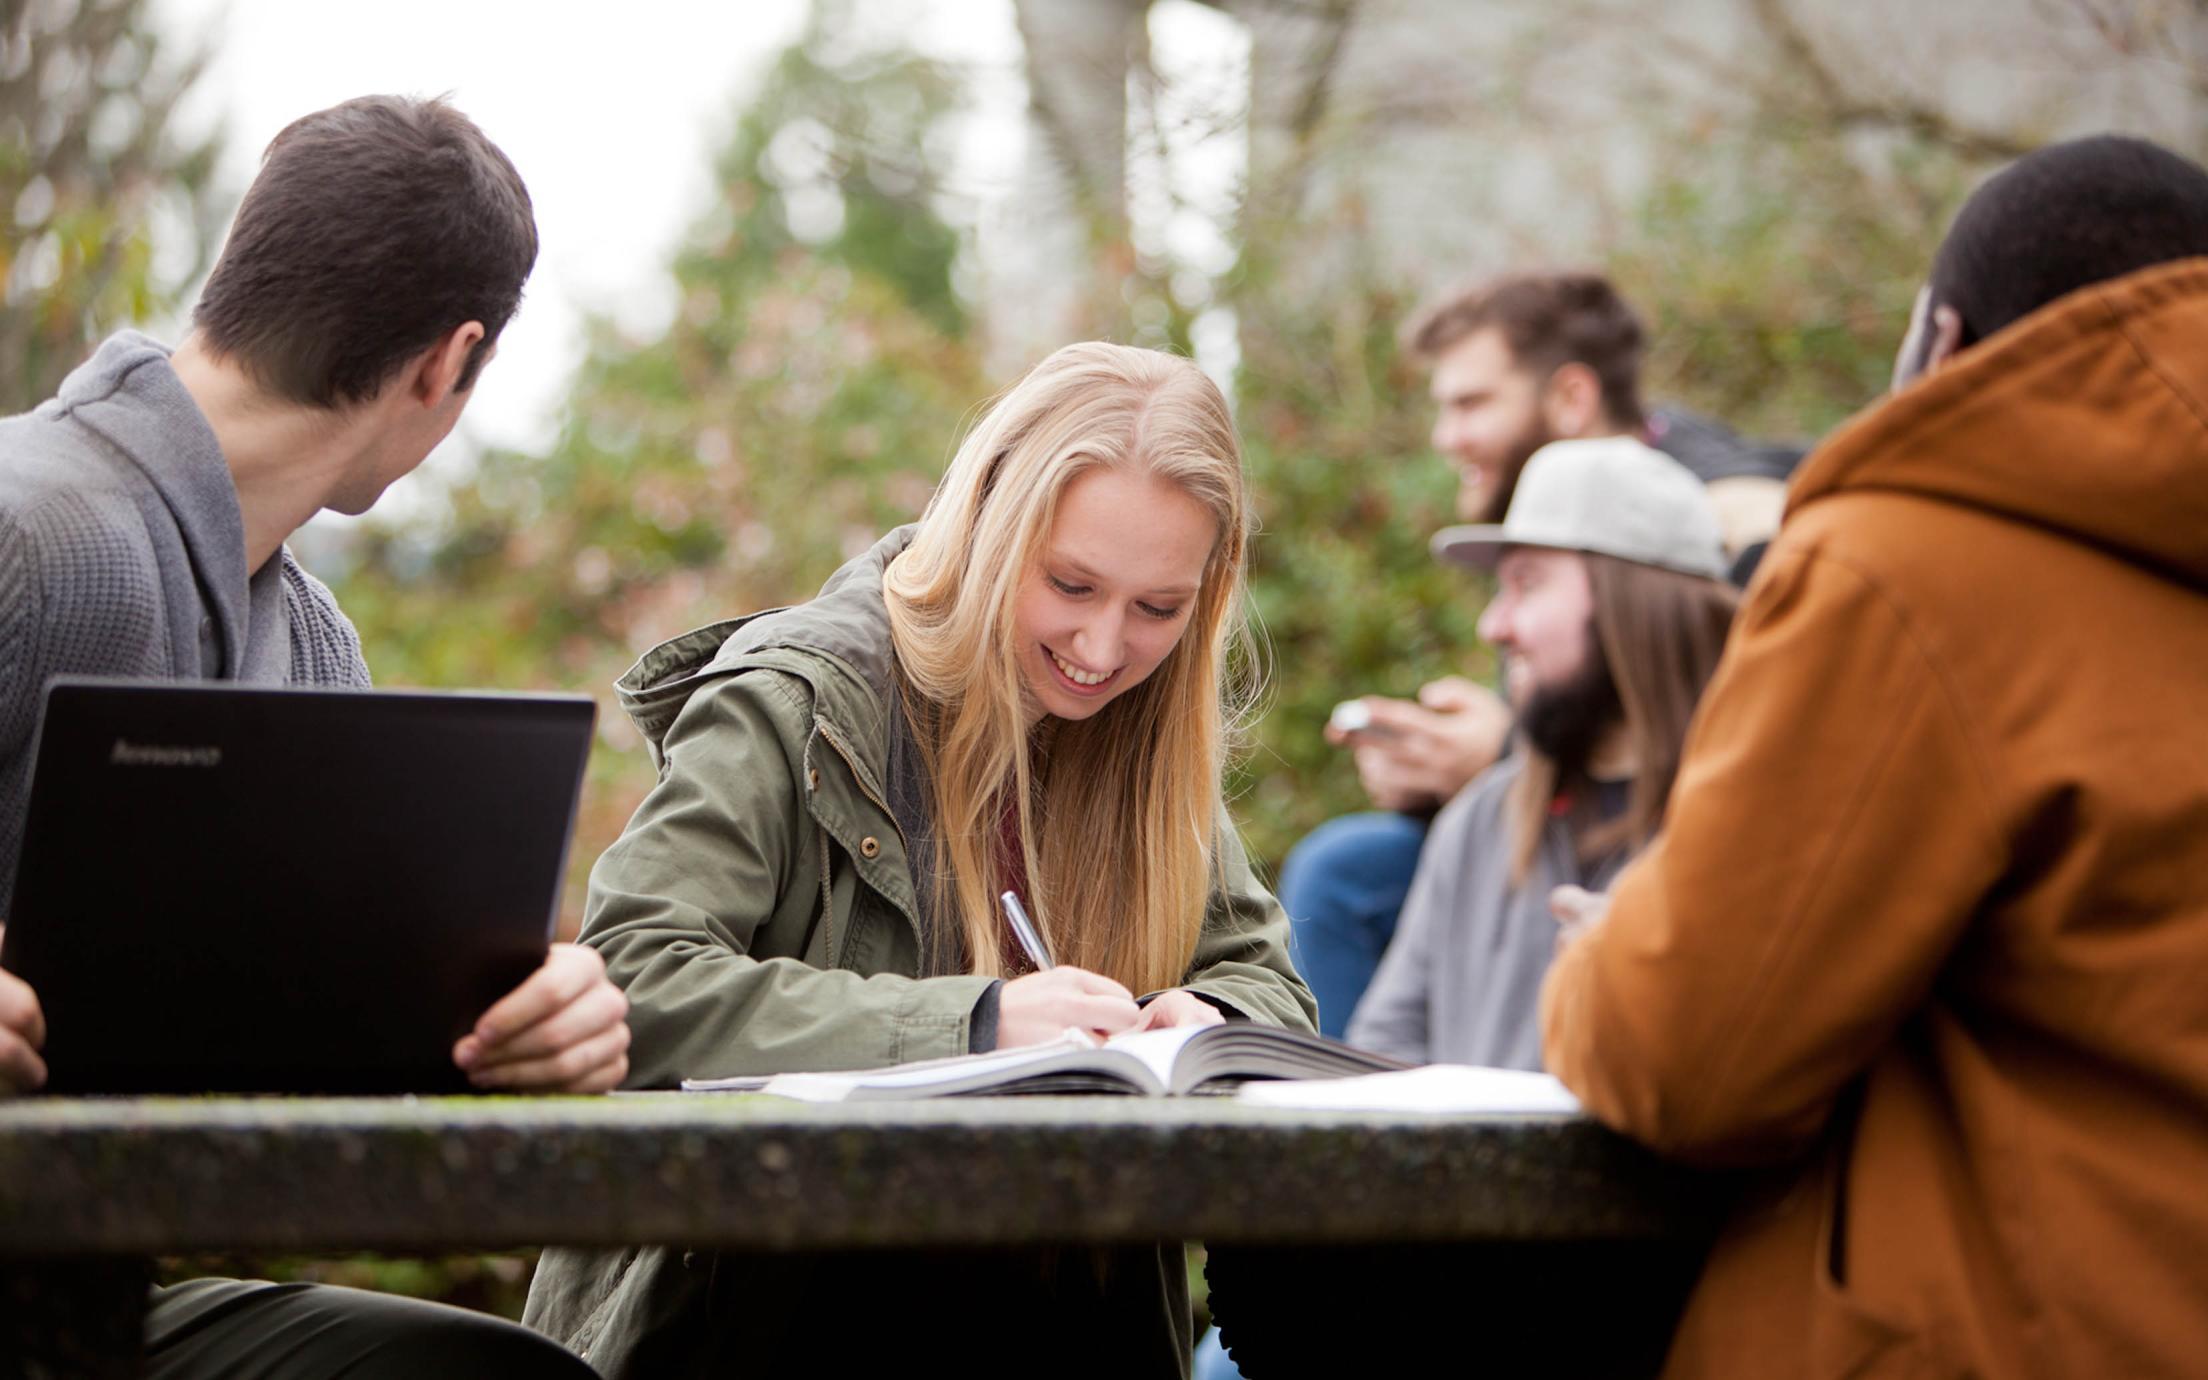 VIU's BA Degree students